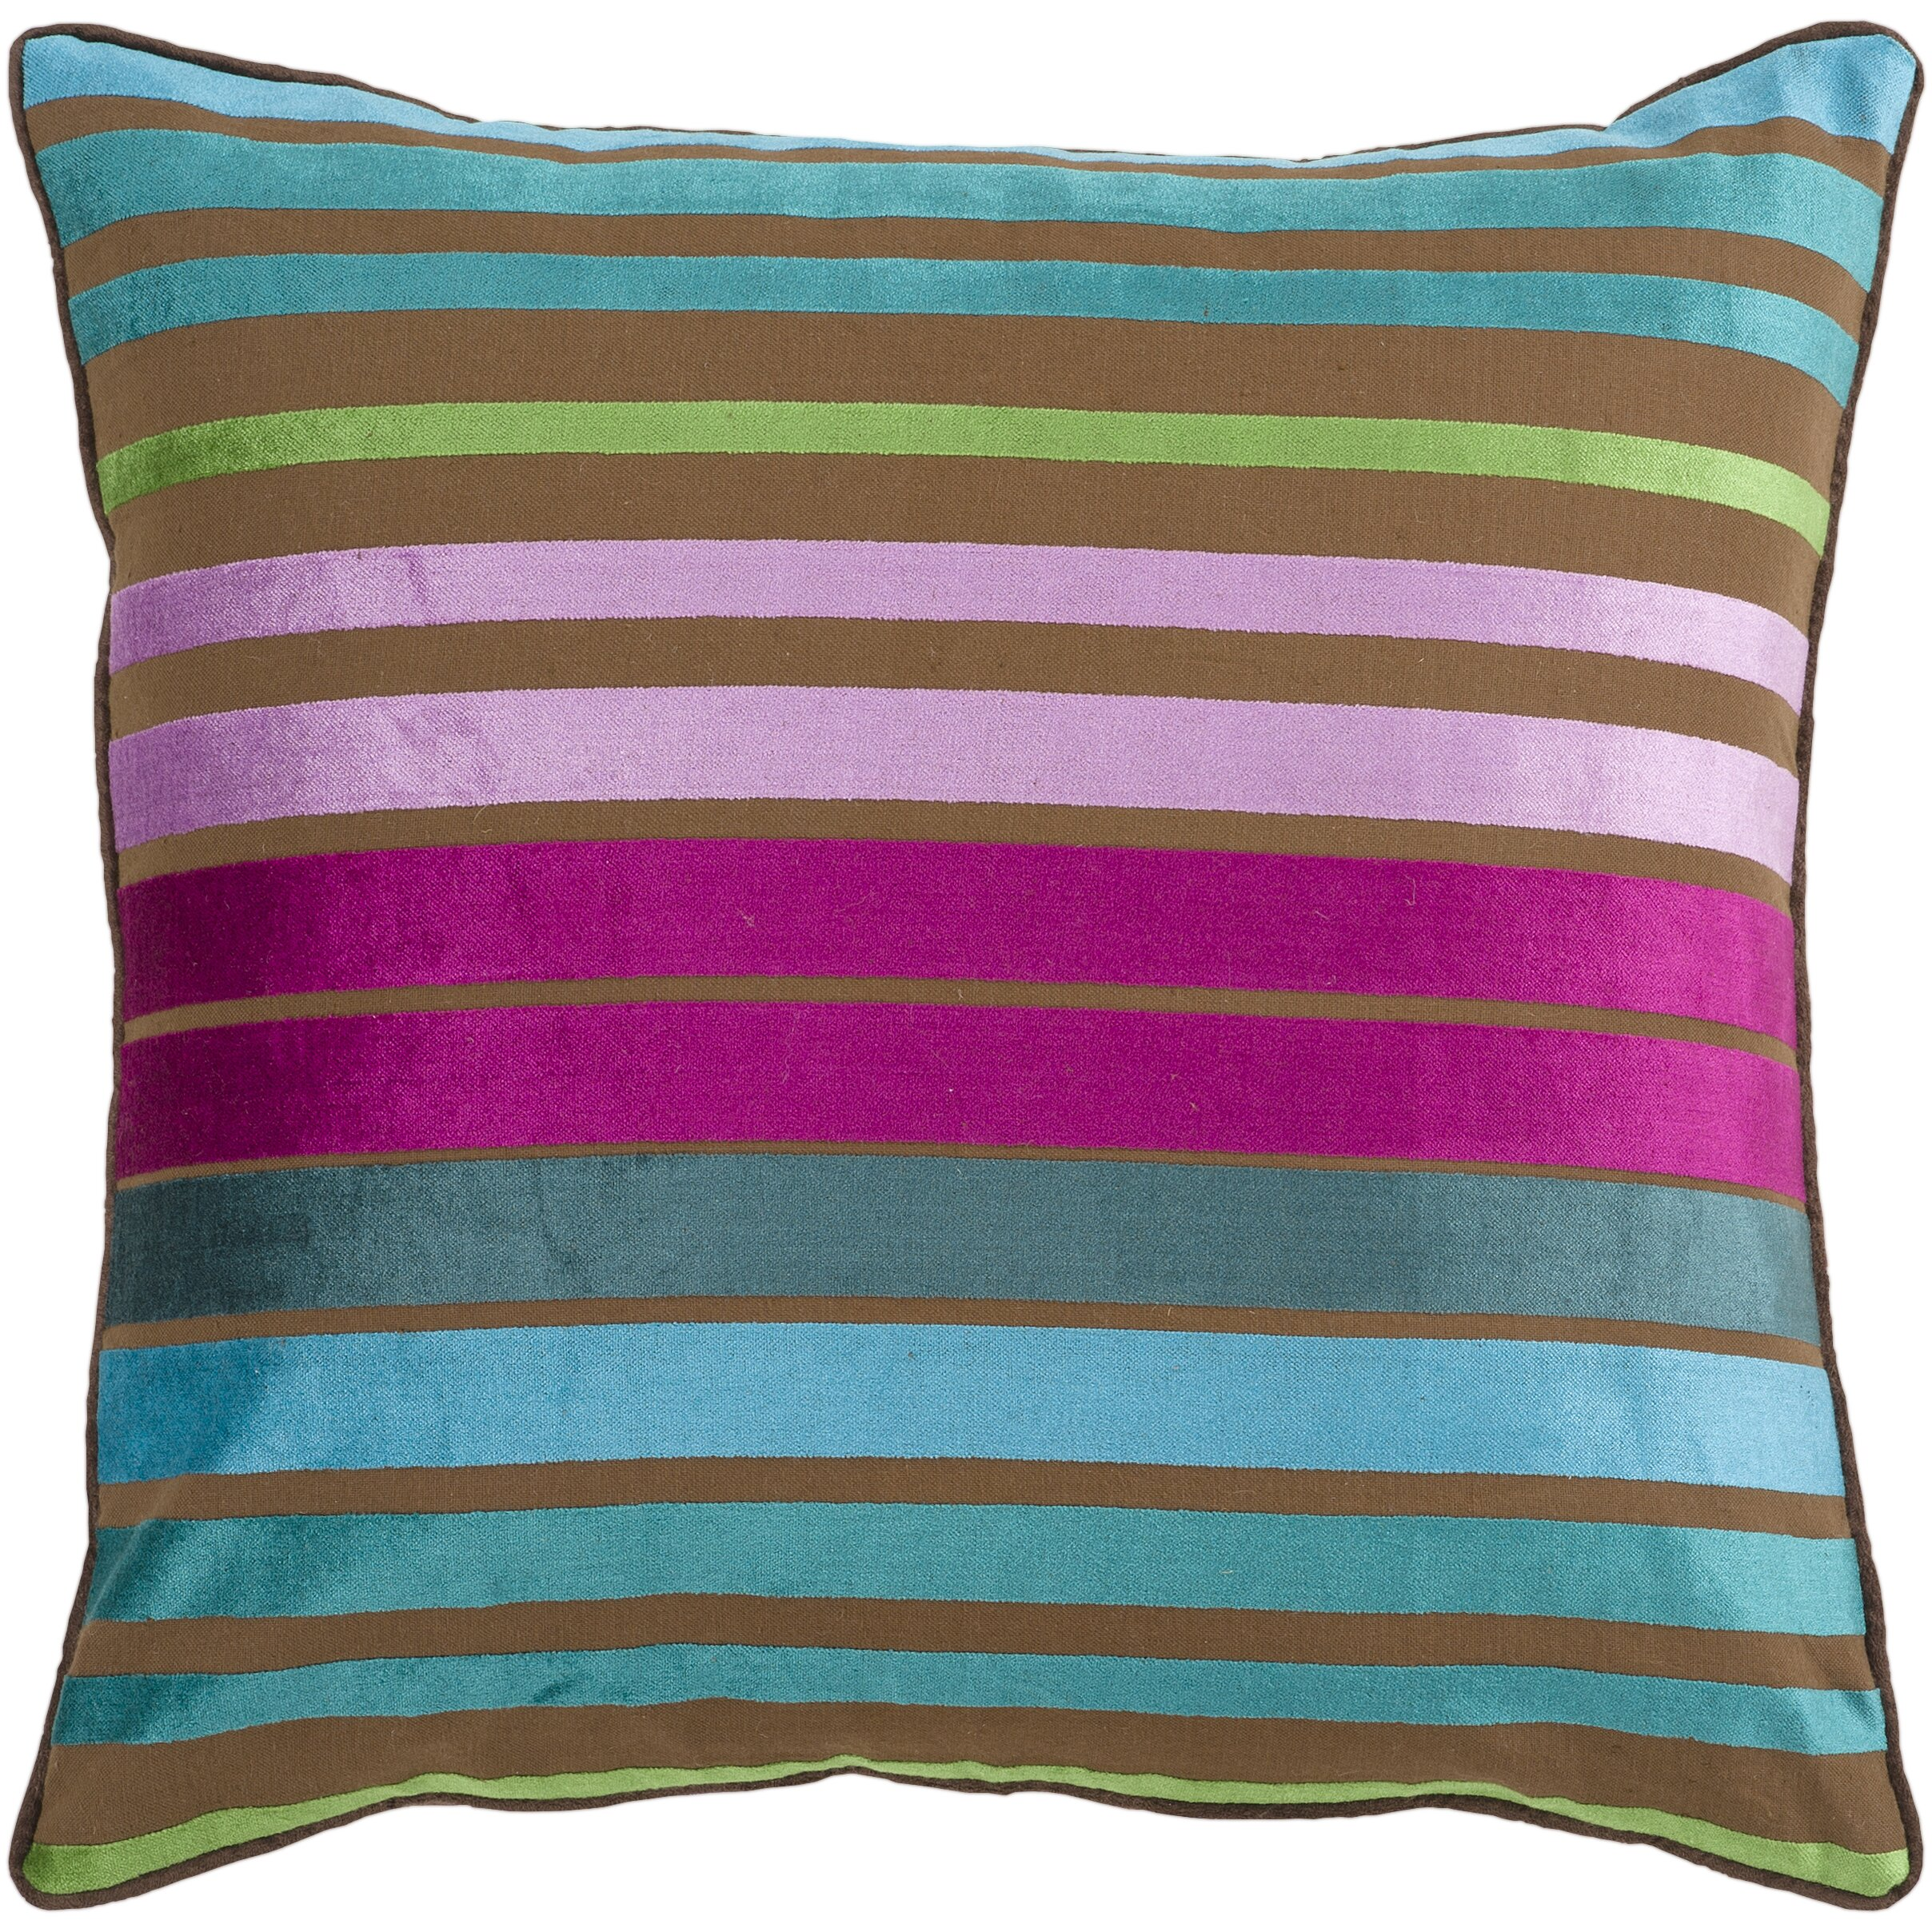 Bungalow Rose Radad Sparkling Stripe Throw Pillow & Reviews Wayfair